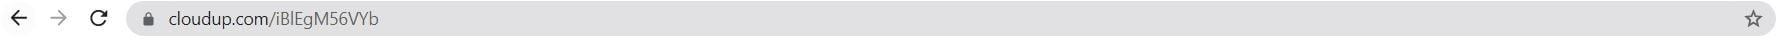 An example Cloudup URL.